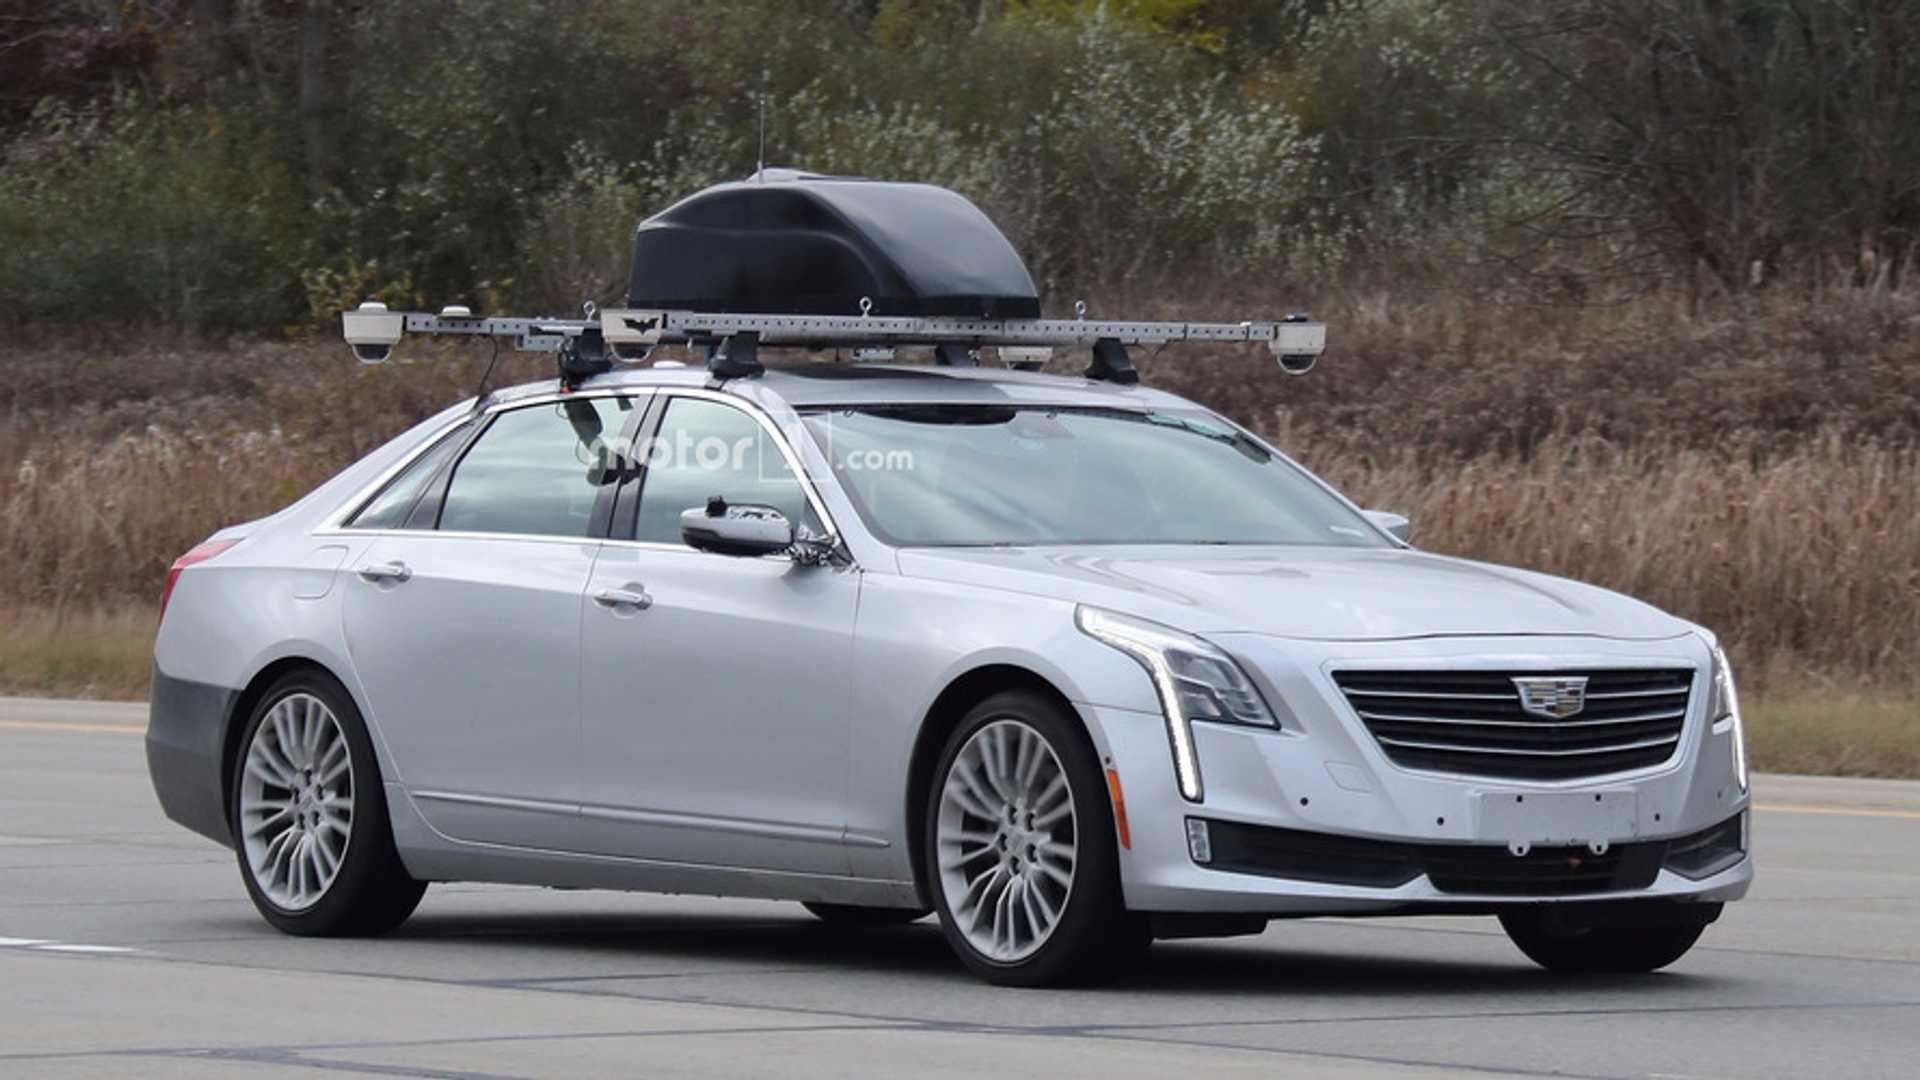 Cadillac CT6 tests Batman-branded Super Cruise semi-autonomous driving tech